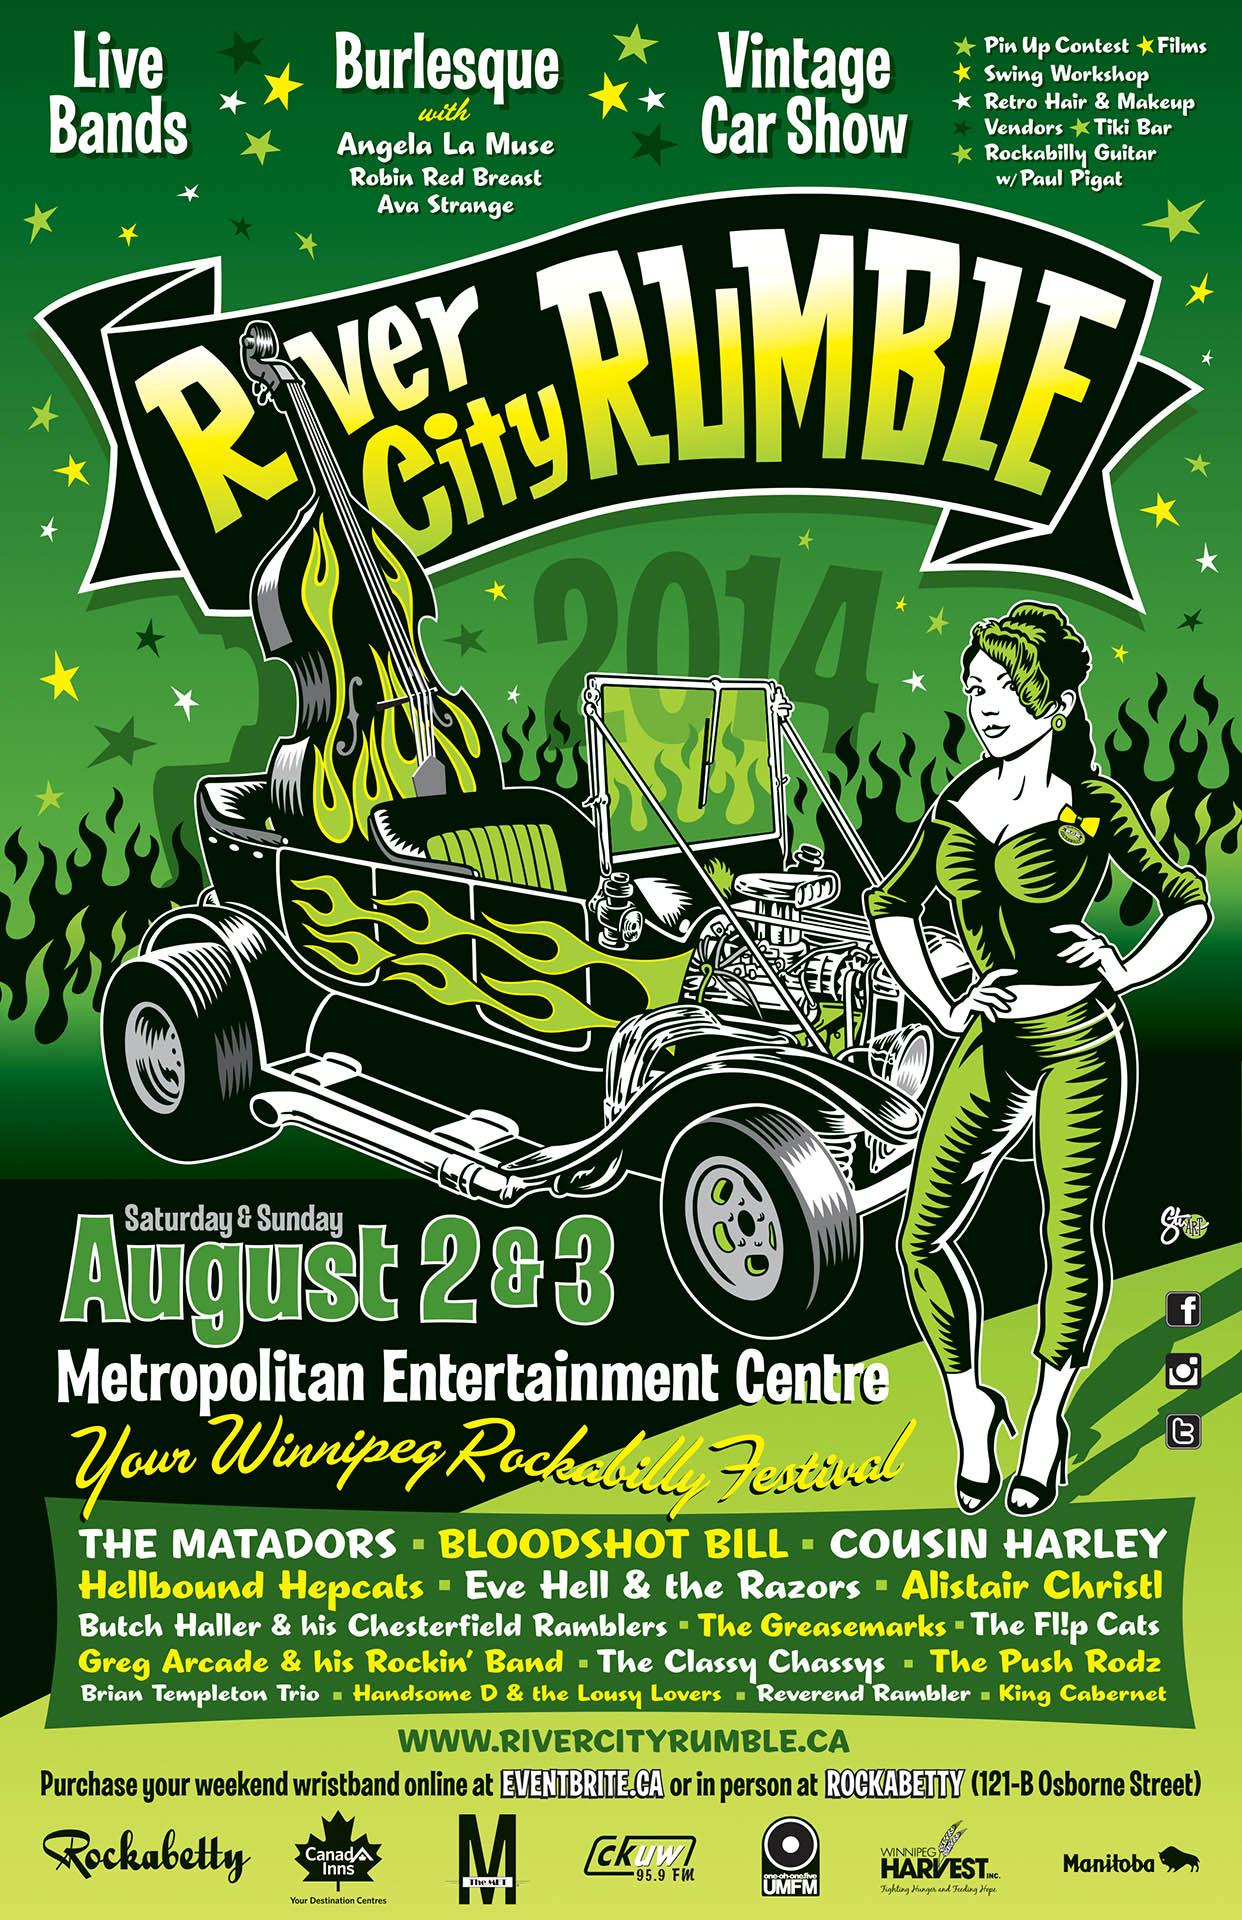 River City Rumble - 2014